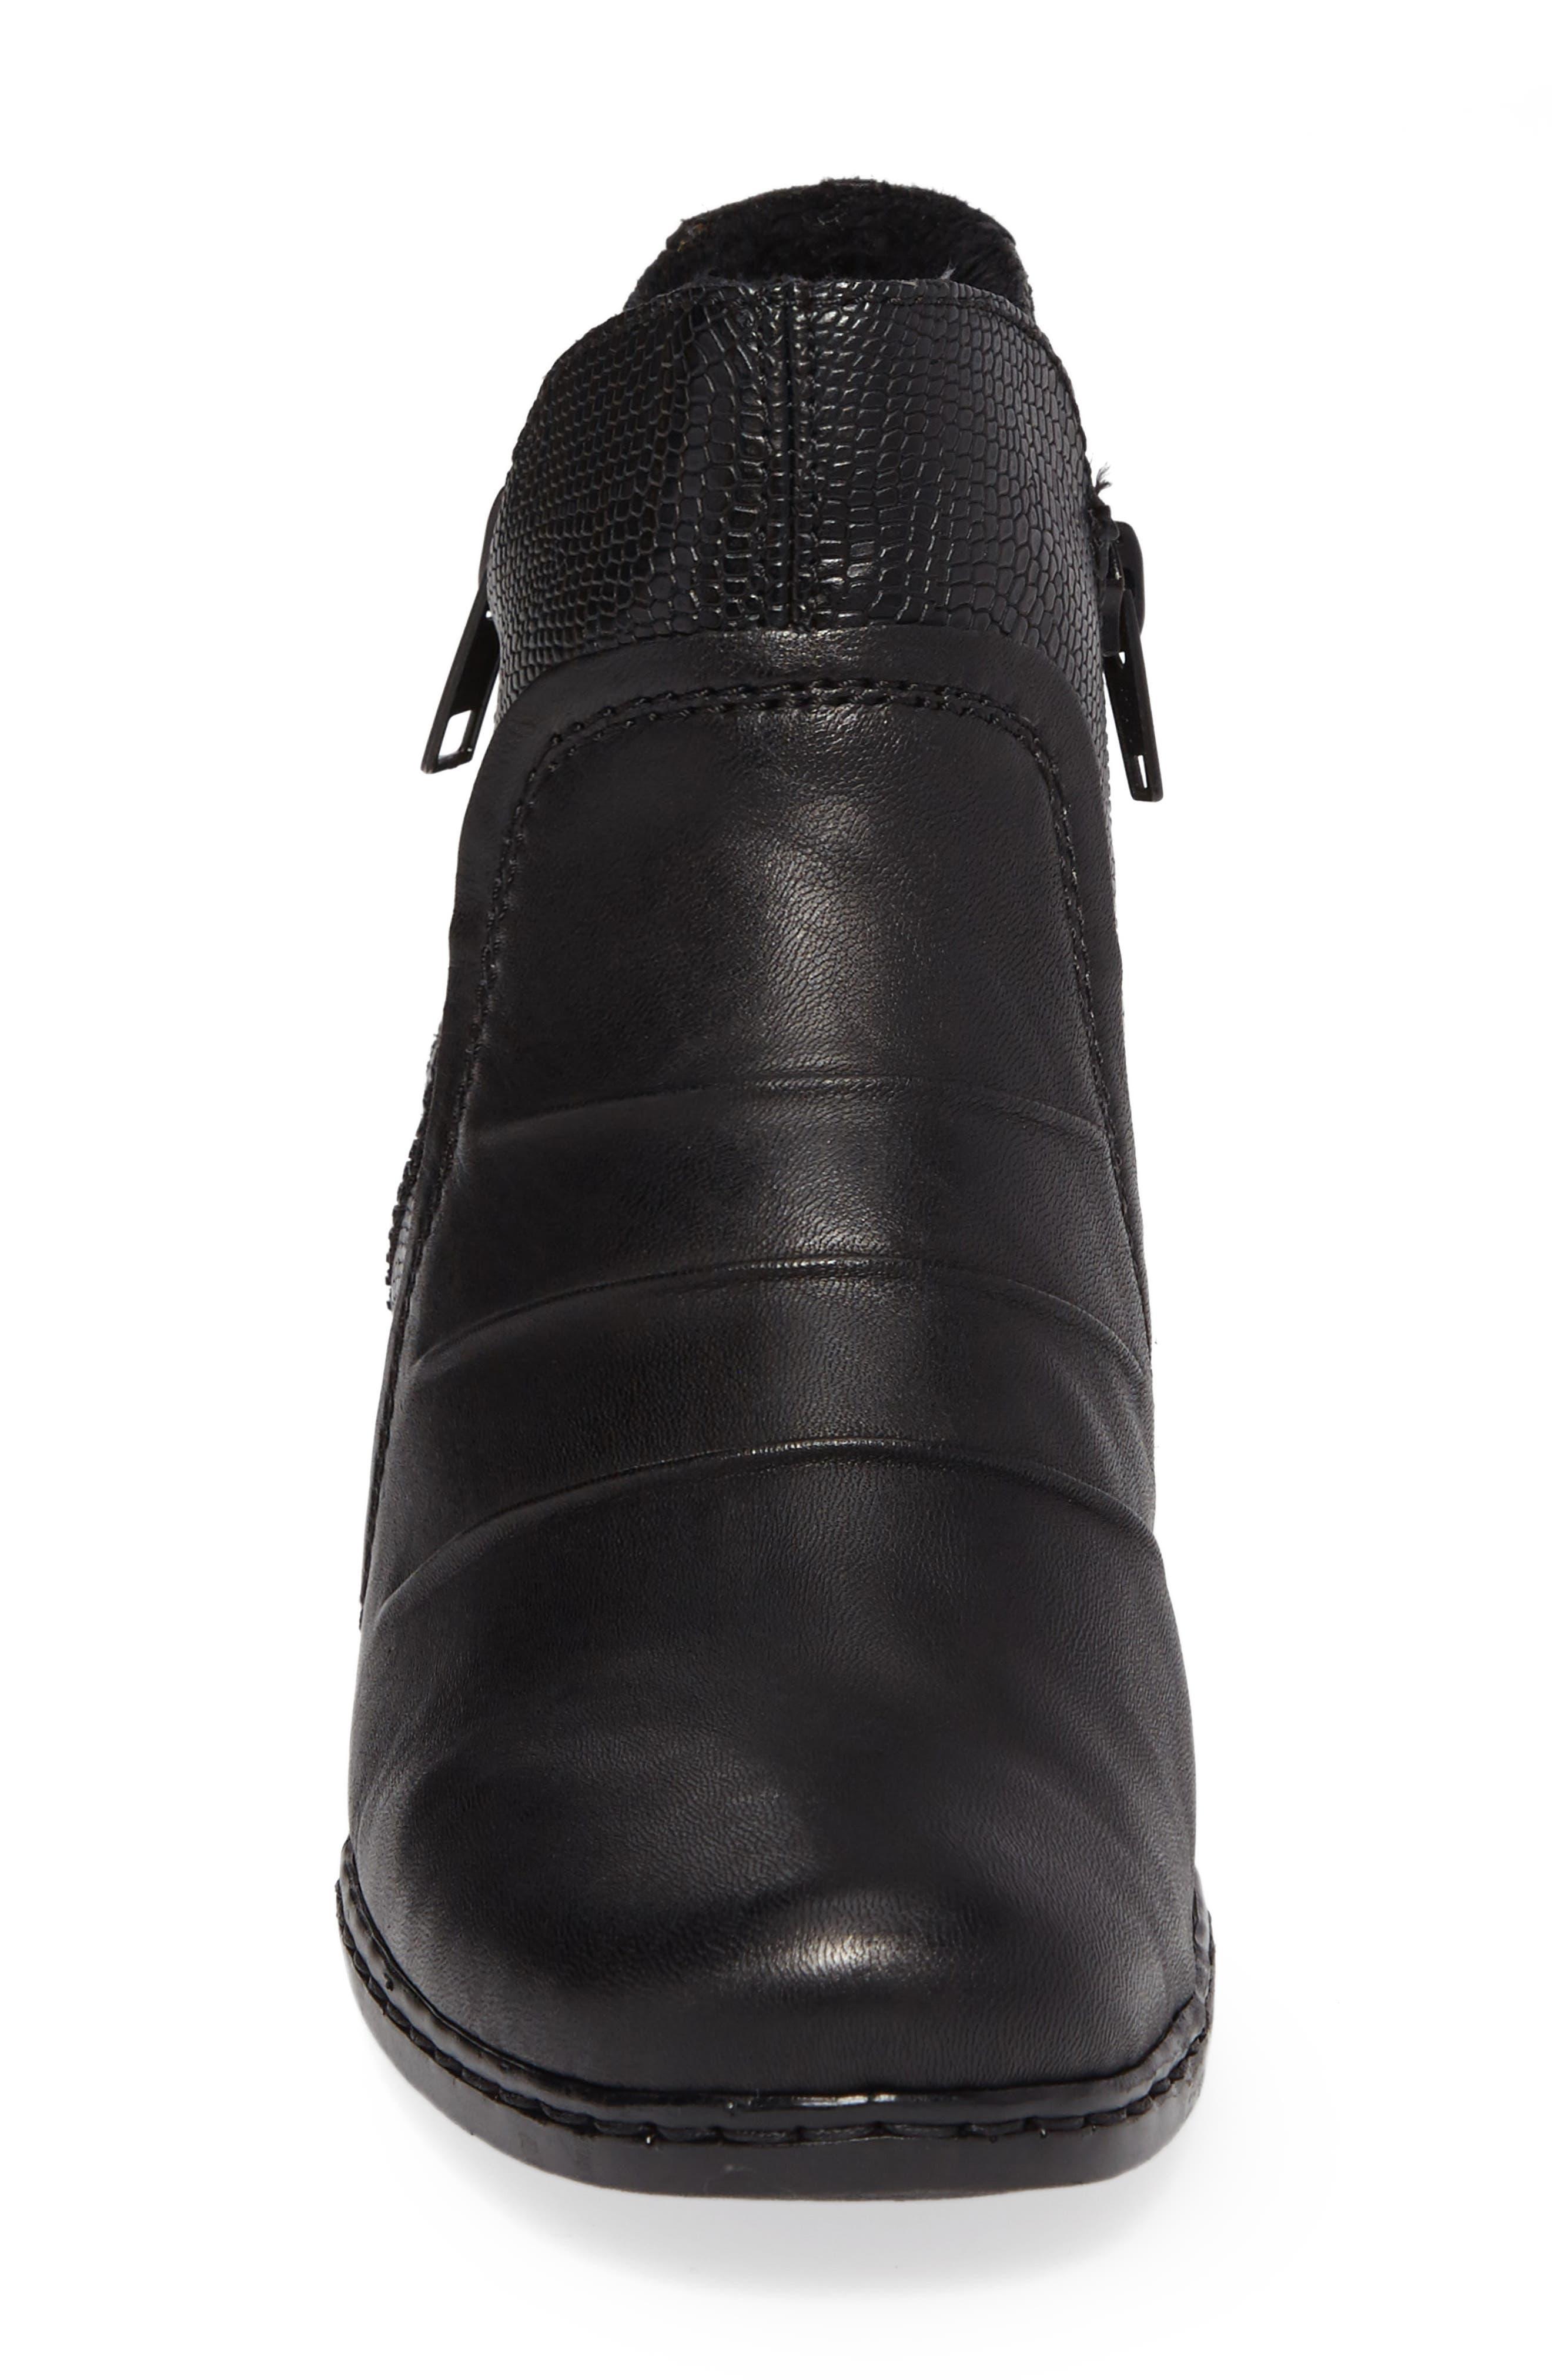 Lynn 62 Bootie,                             Alternate thumbnail 4, color,                             Schwarz Nero Leather